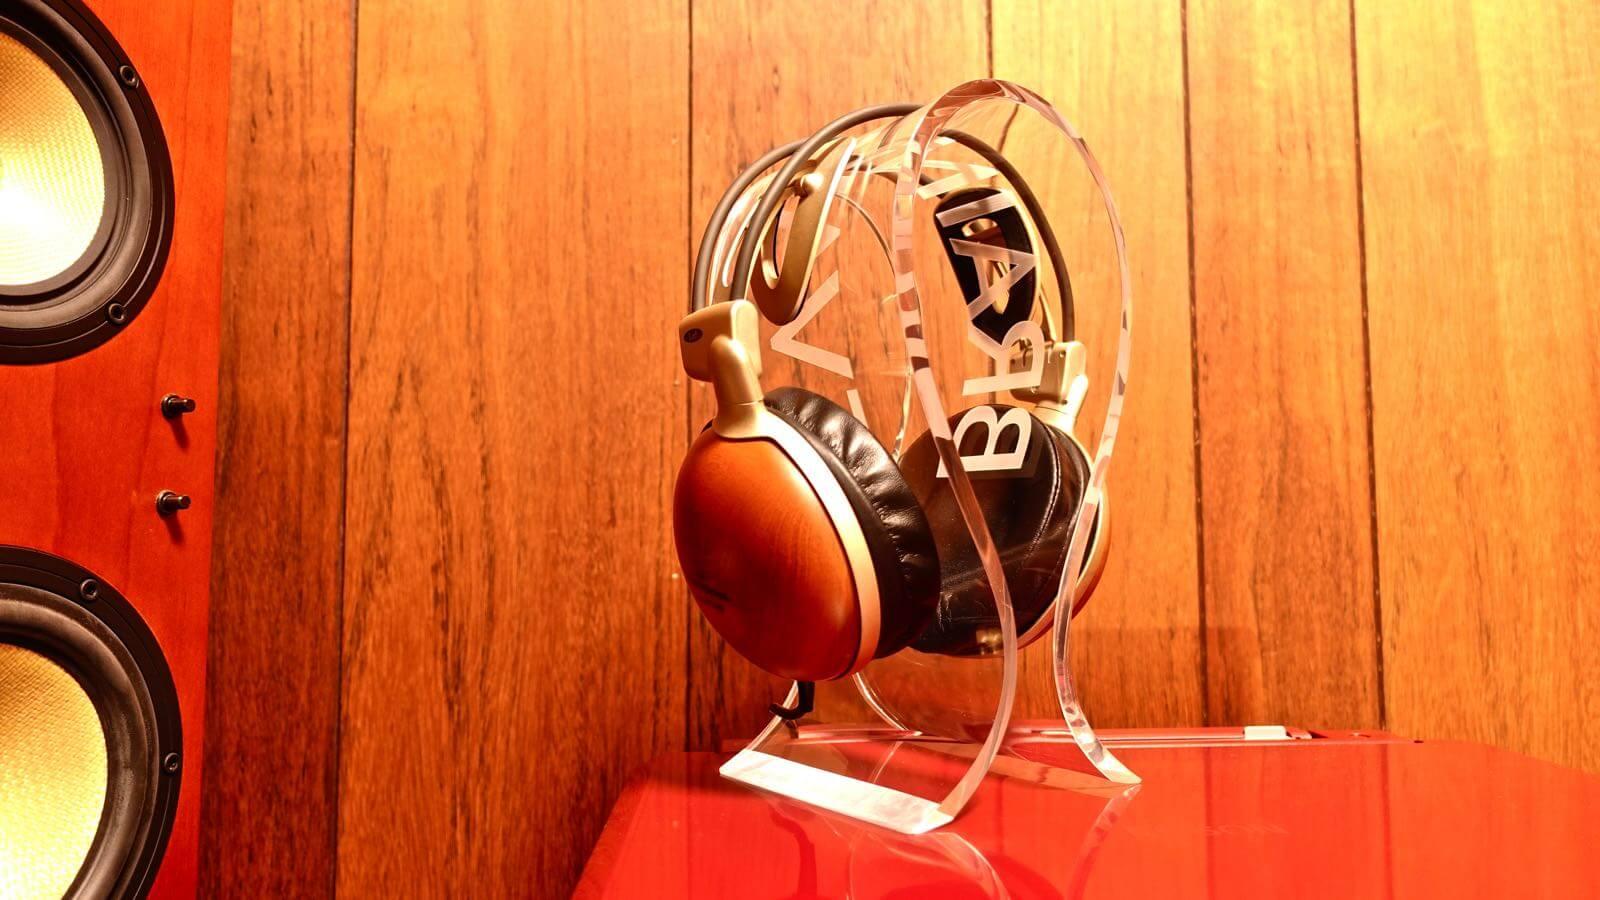 0080 OMEGA type headphone stand BRAINWAVZ review 12